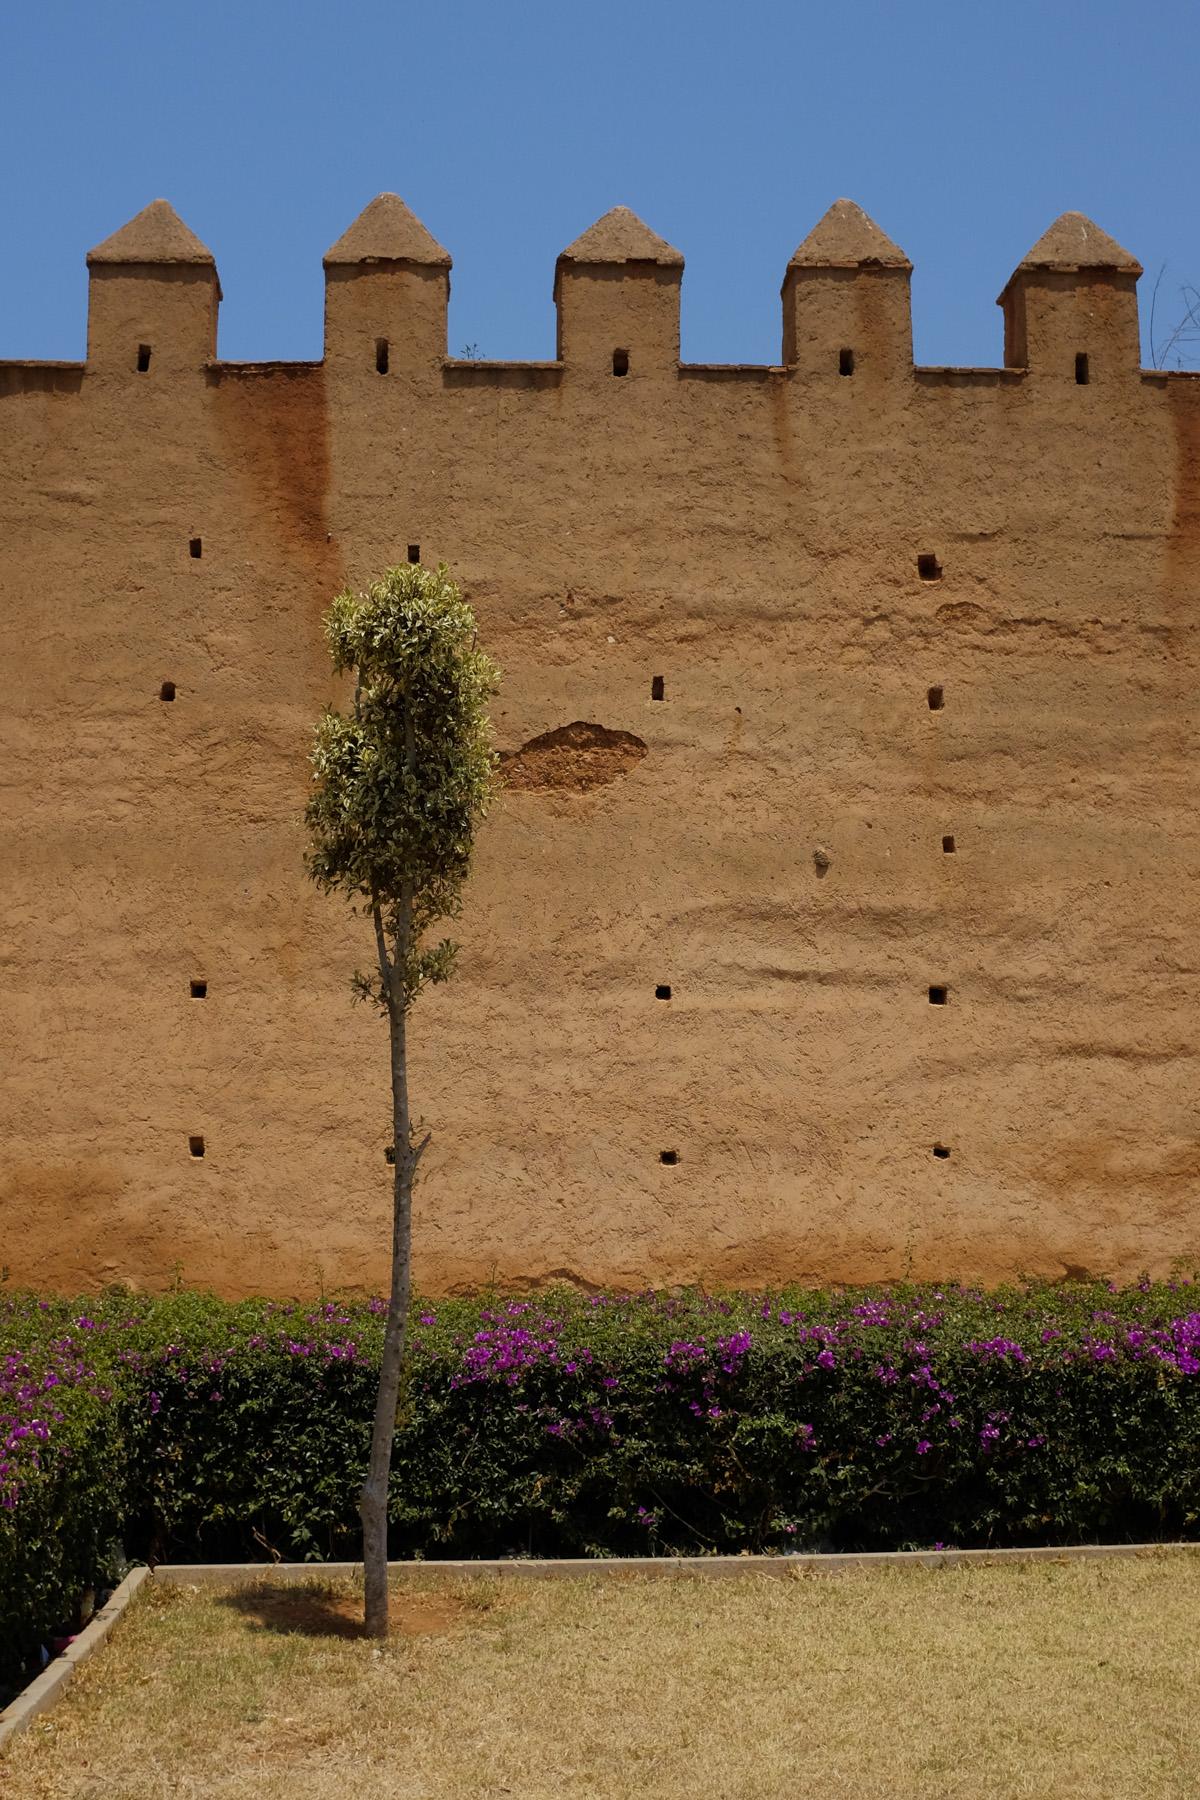 201307 Rabat 006.jpg